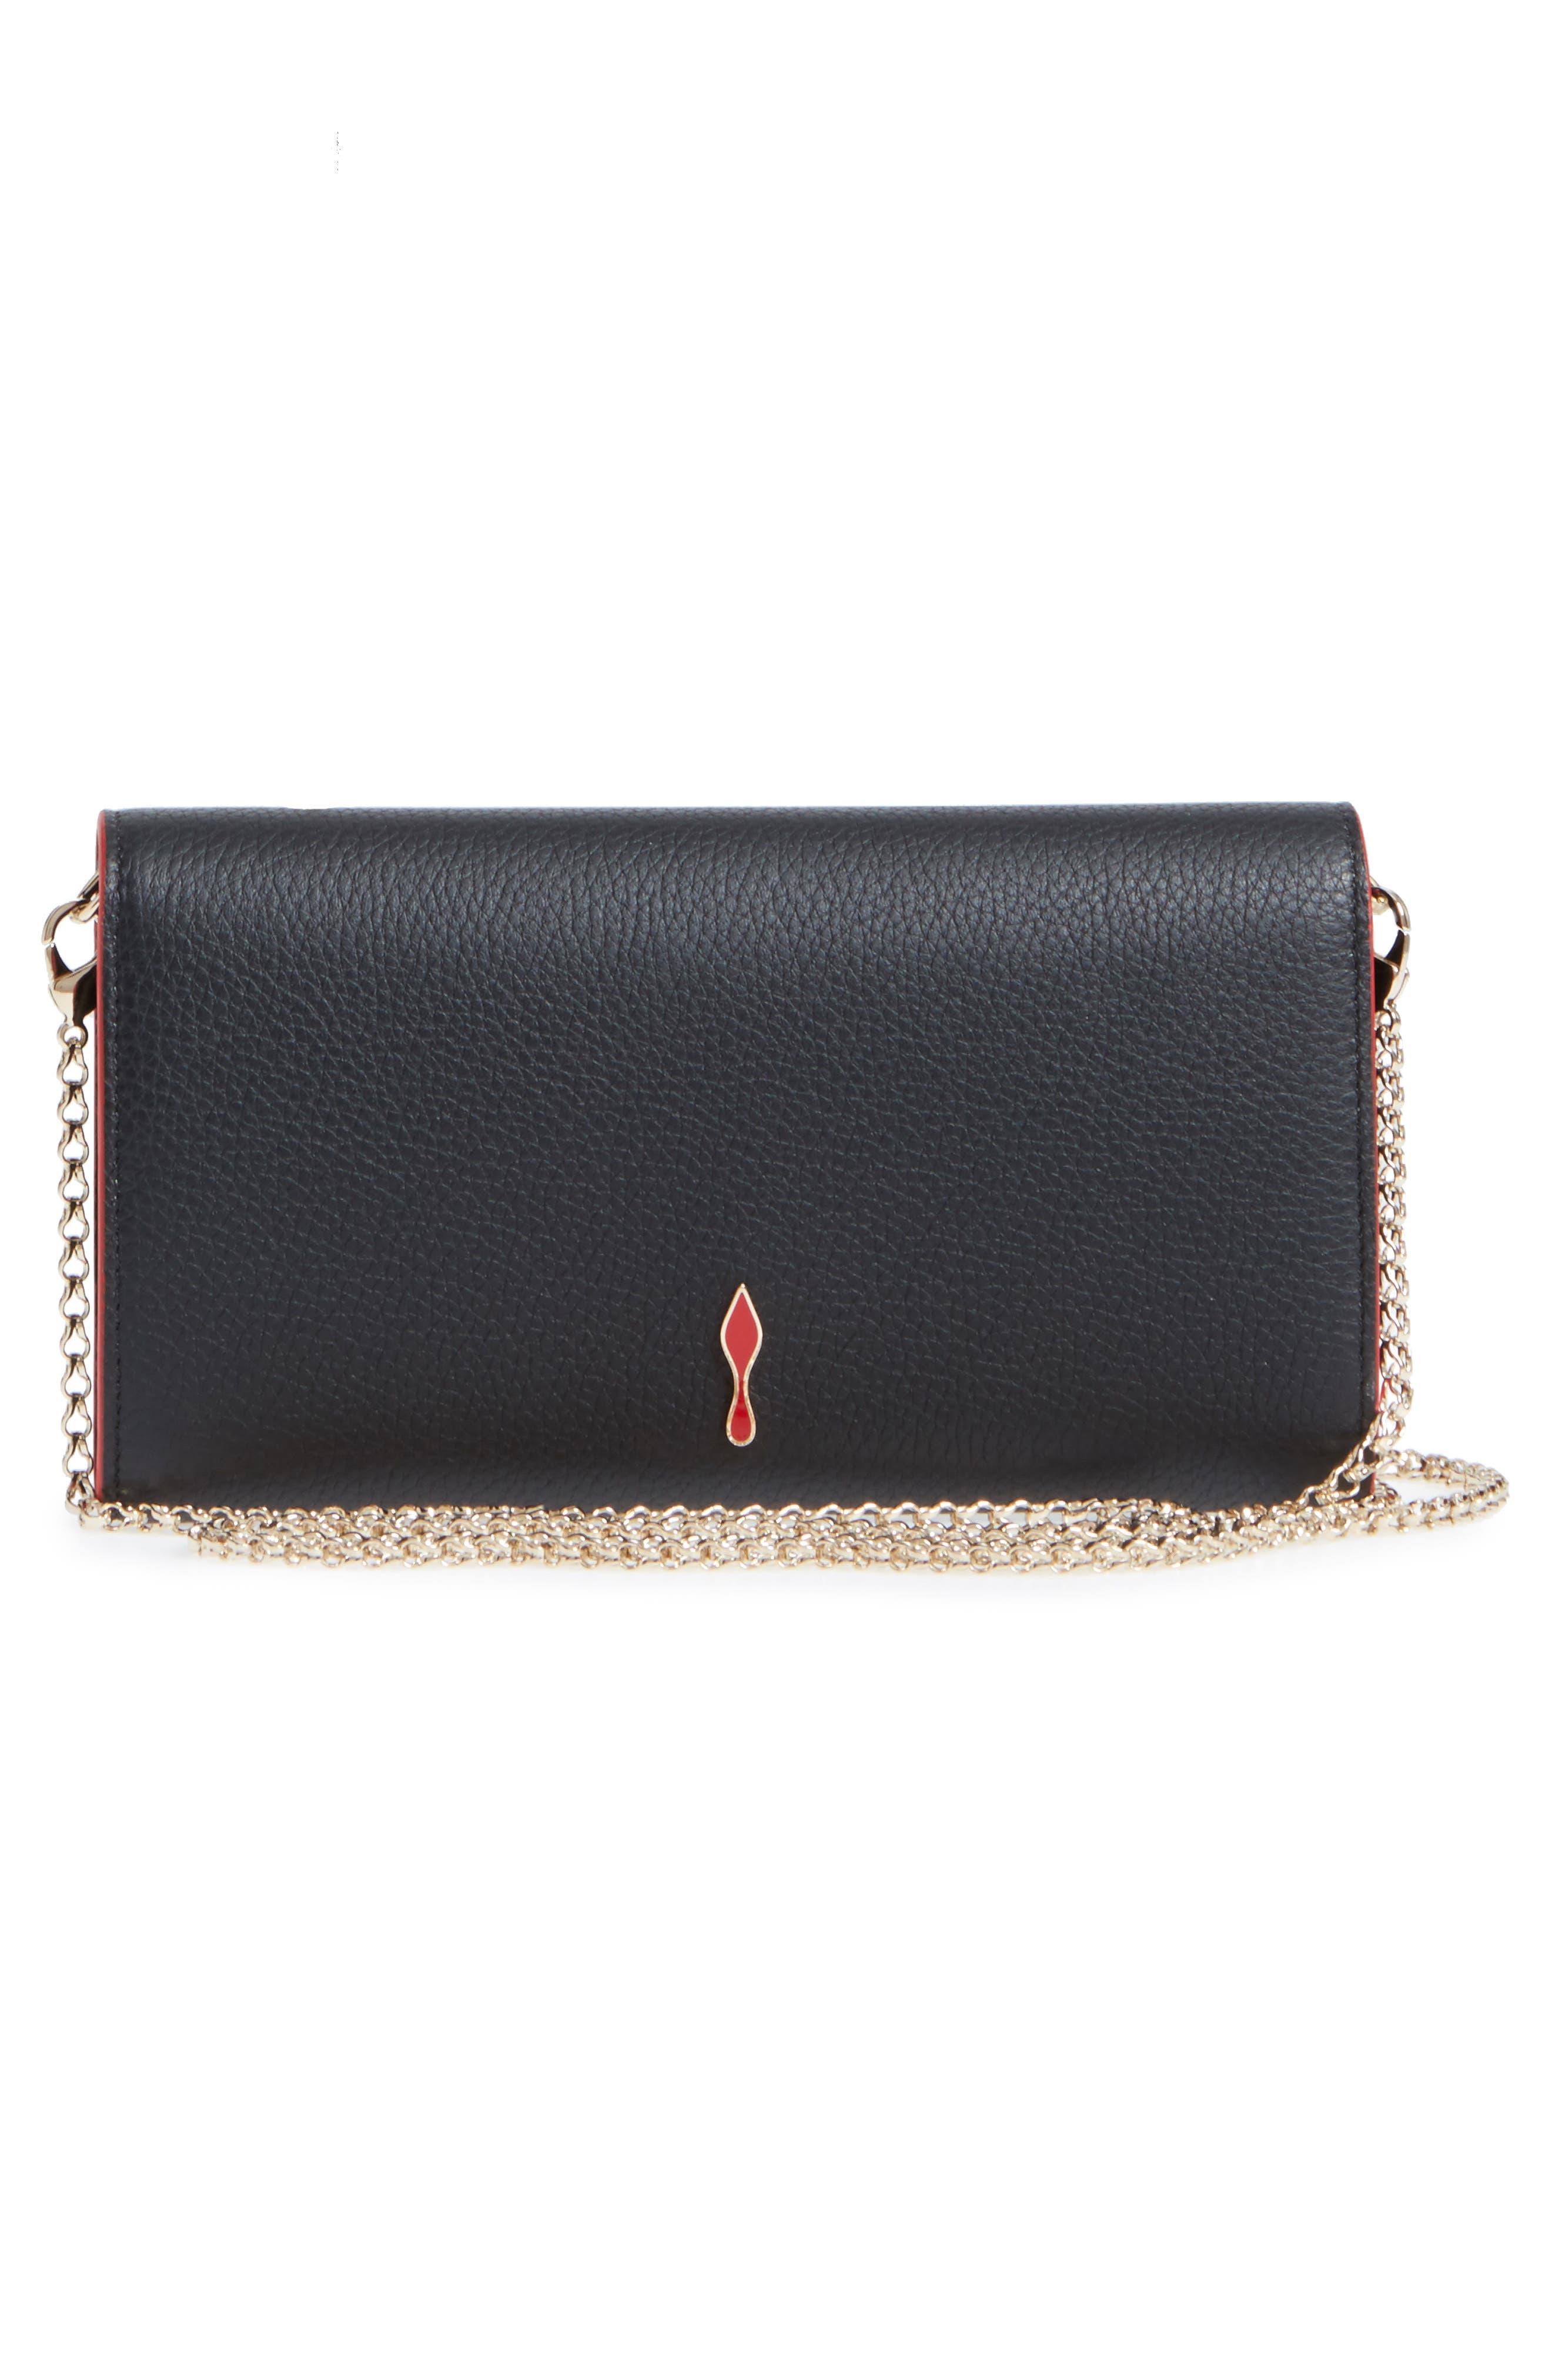 Boudoir Calfskin Leather Wallet,                             Alternate thumbnail 3, color,                             BLACK/ GOLD